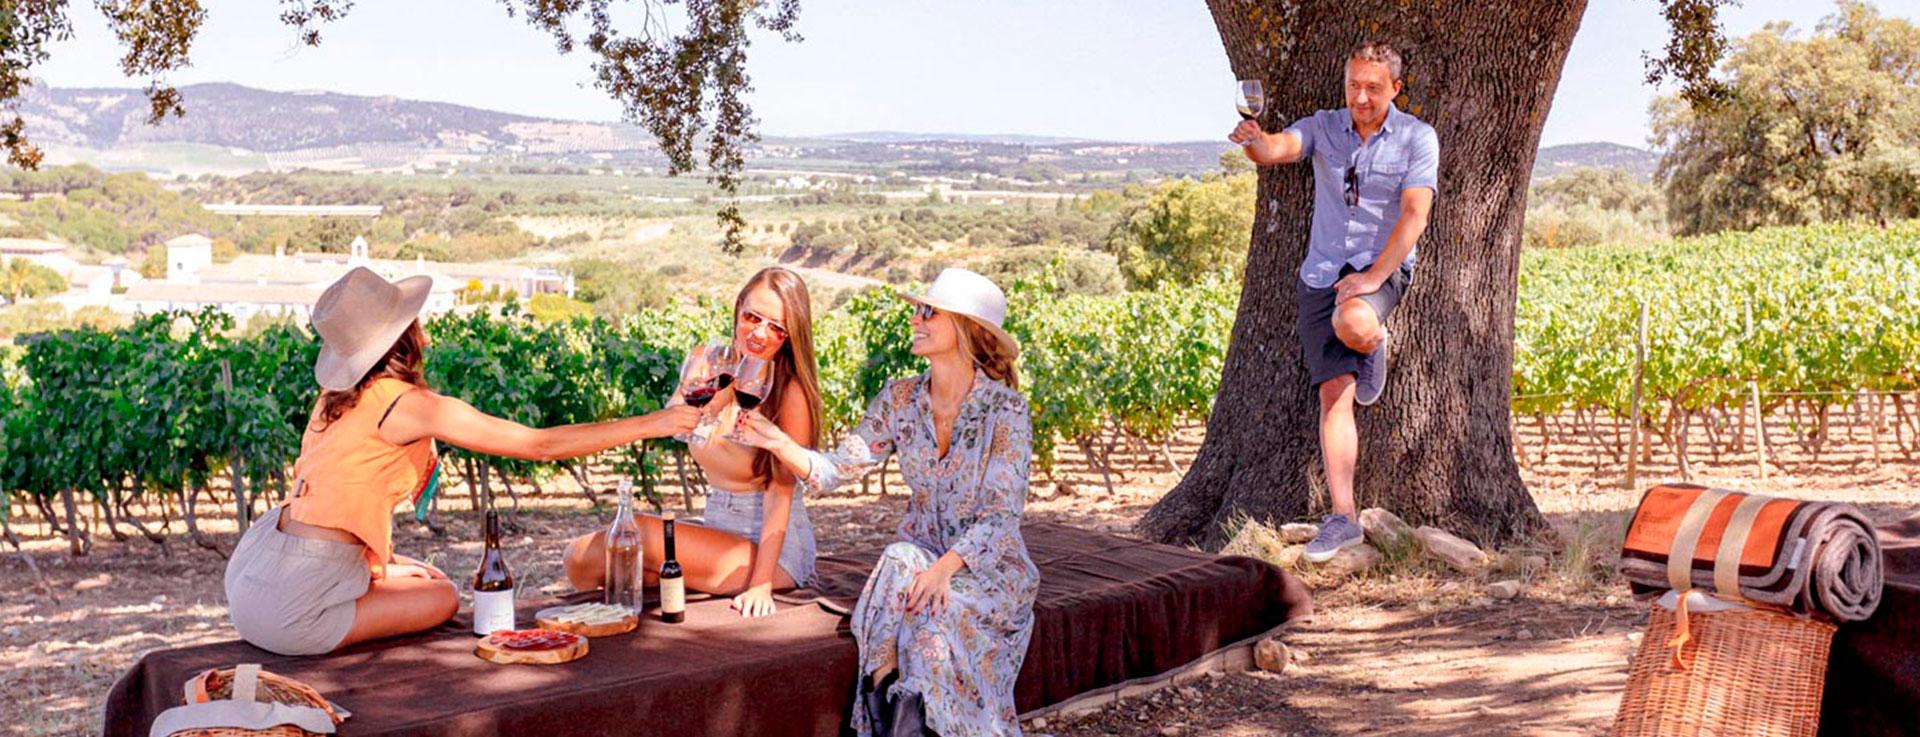 The wine harvest of Ronda